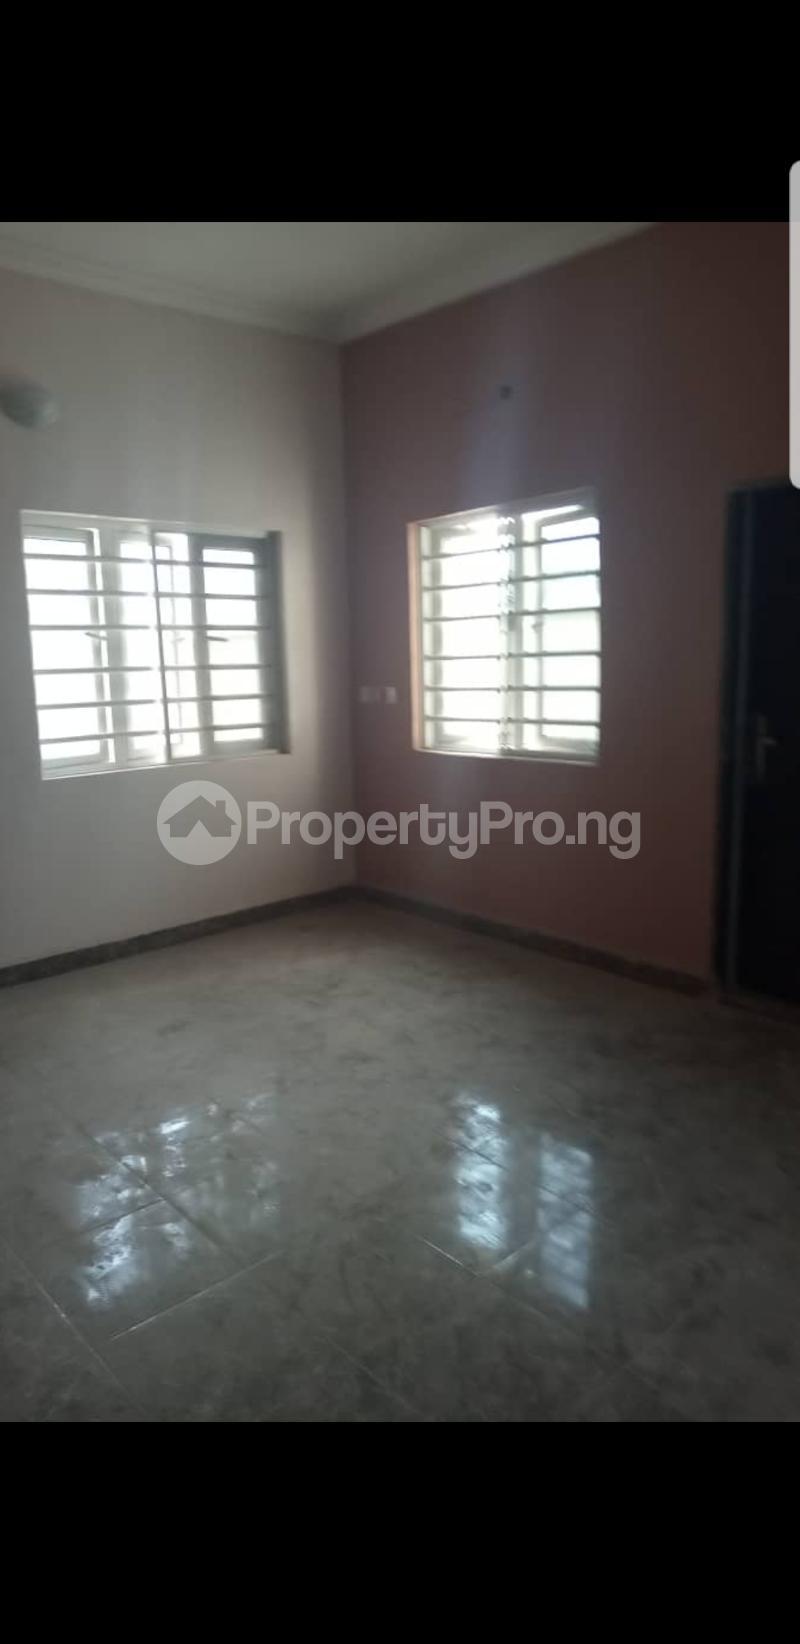 3 bedroom Shared Apartment Flat / Apartment for rent Enugu Enugu - 2